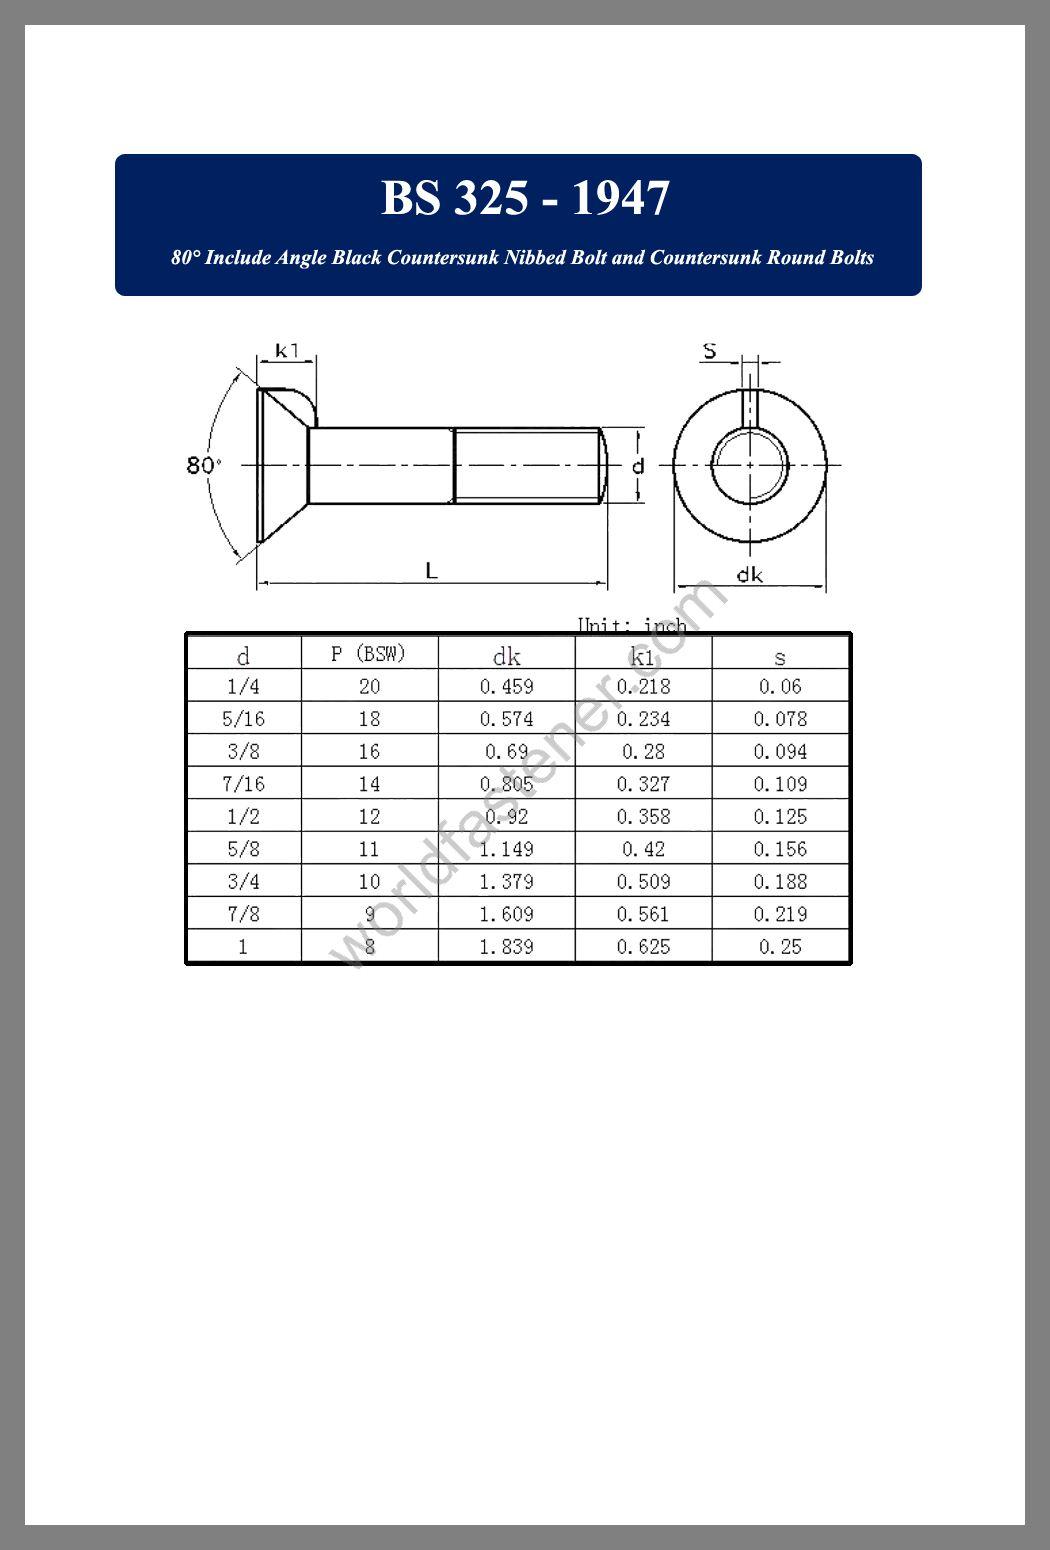 BS 325, Countersunk Head Bolts, Countersunk Head Screws, fastener, screw, bolt, bs standards bolts, bsi standard bolts, bsi standard screws